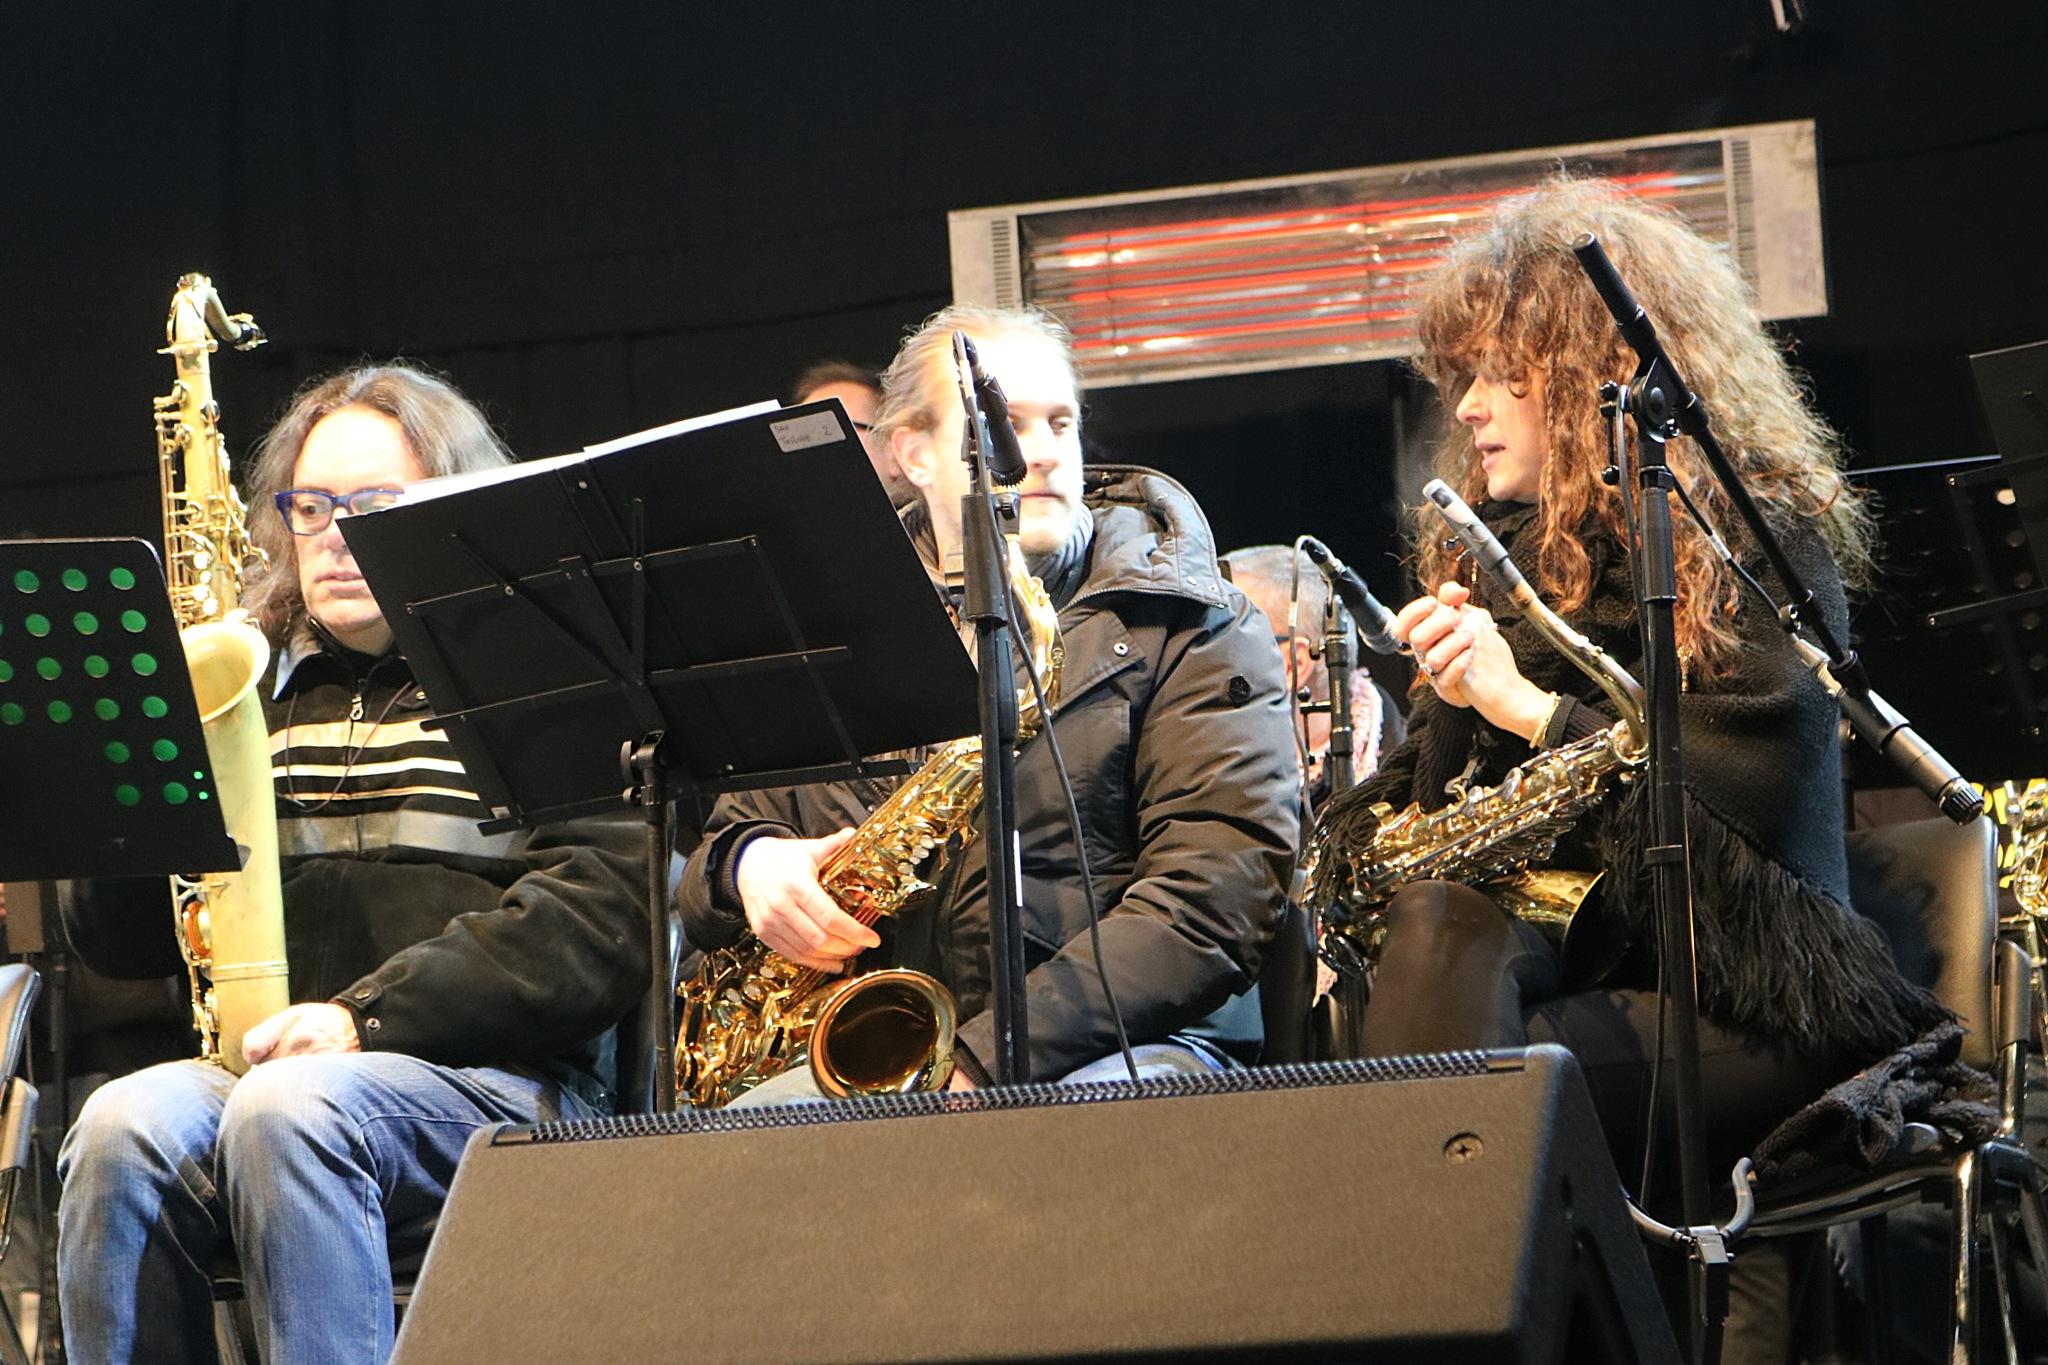 Big band Theory, Trieste by zvnktomasevic